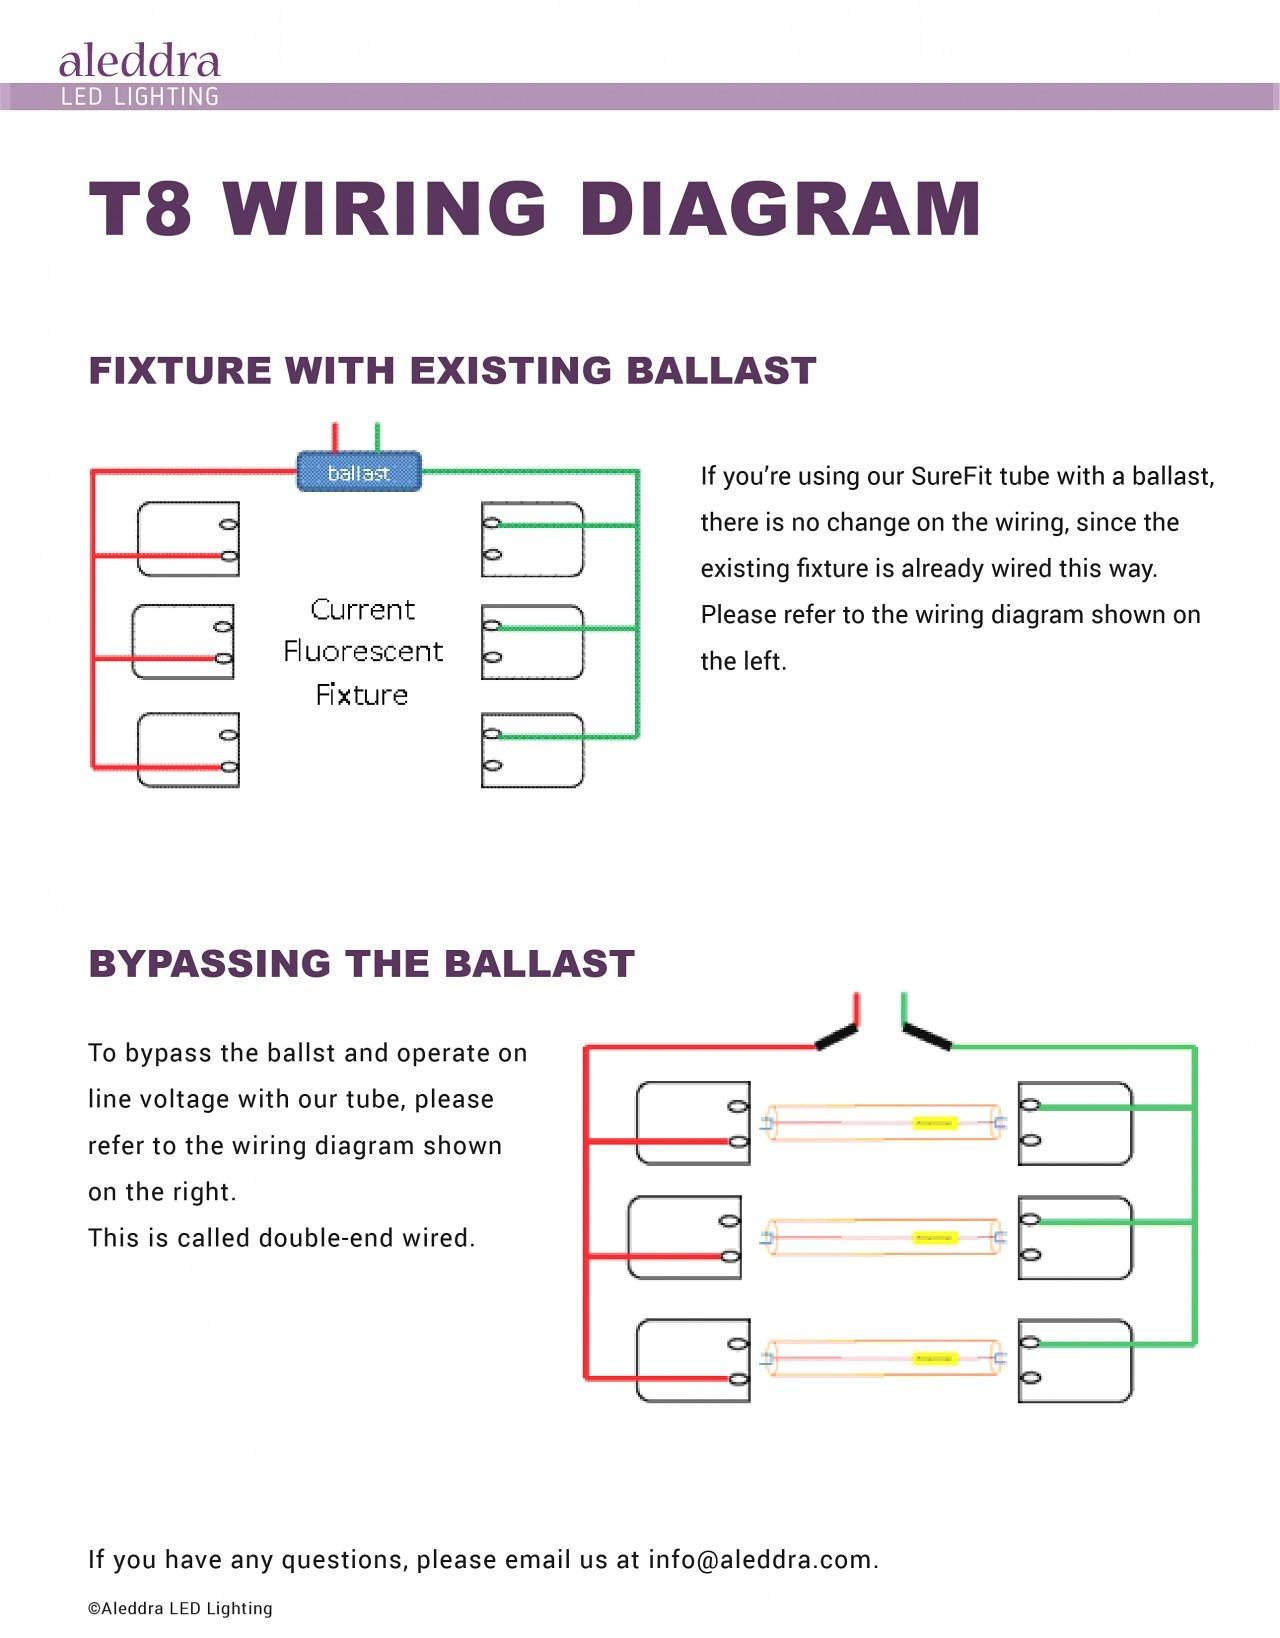 Exelent High Pressure Sodium Wiring Diagram Ornament - Electrical ...